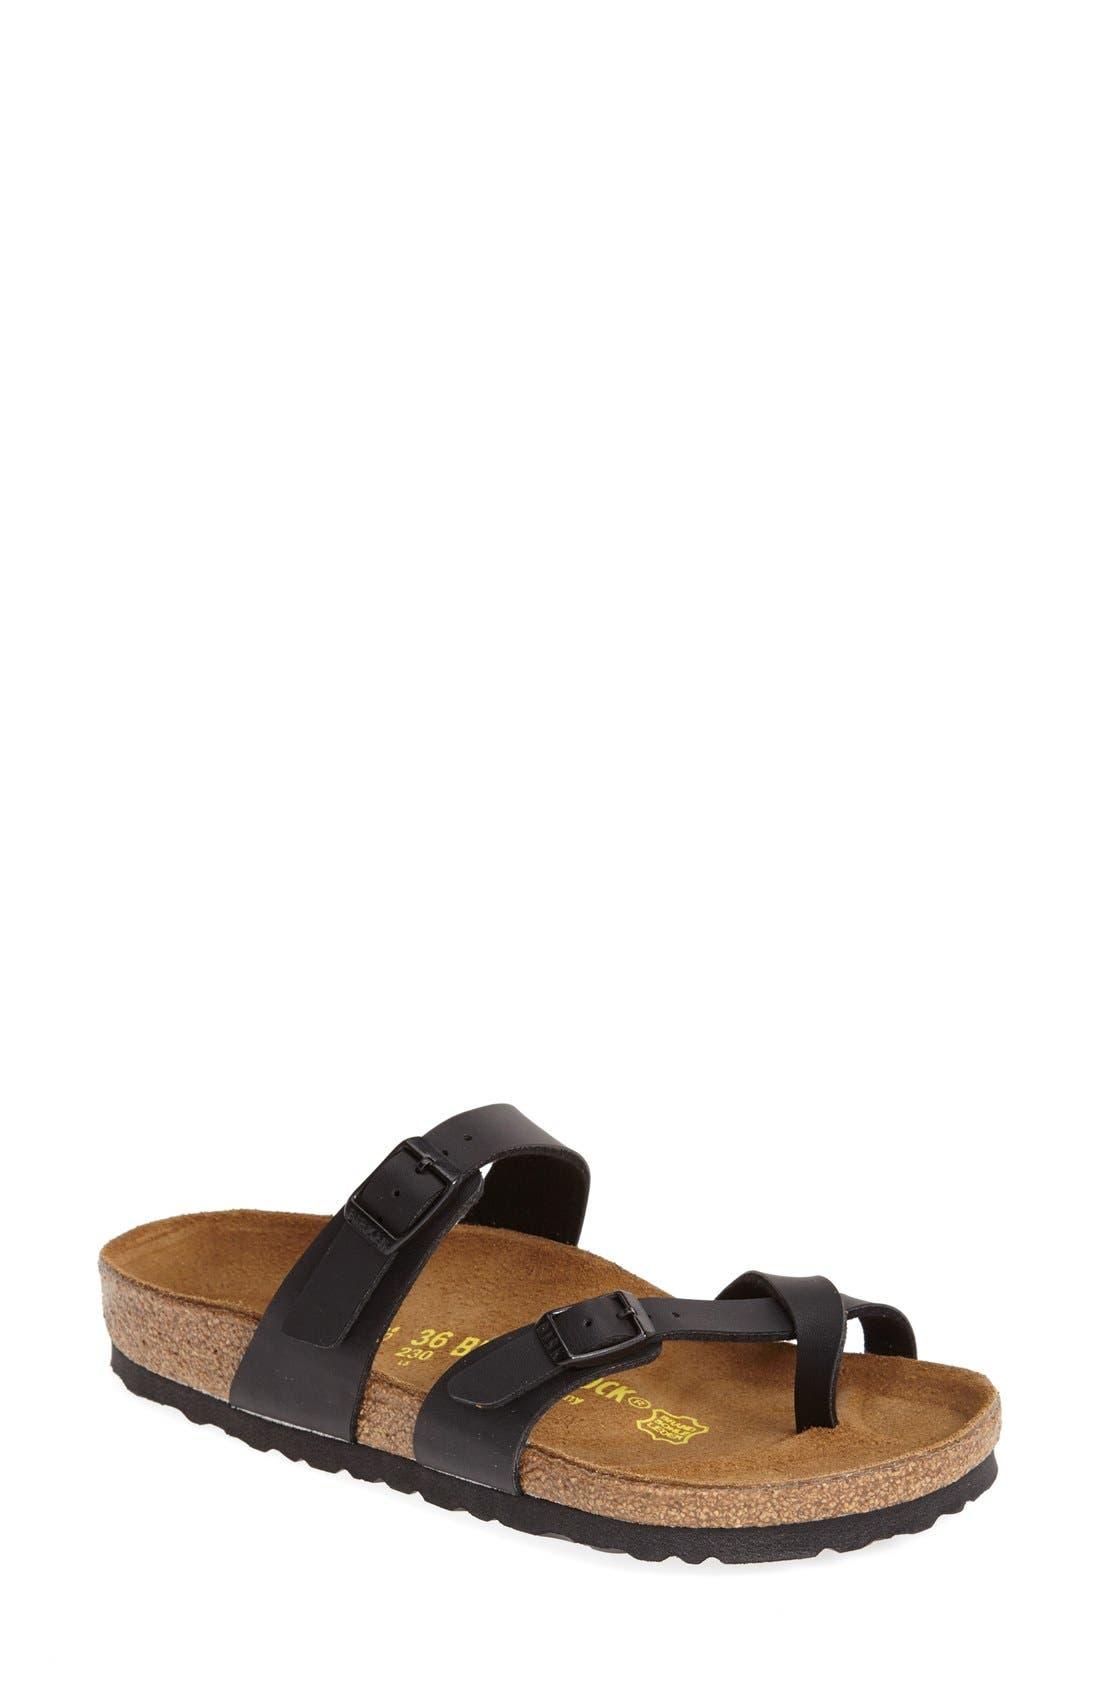 Image of Birkenstock Mayari Sandal - Narrow Width Available